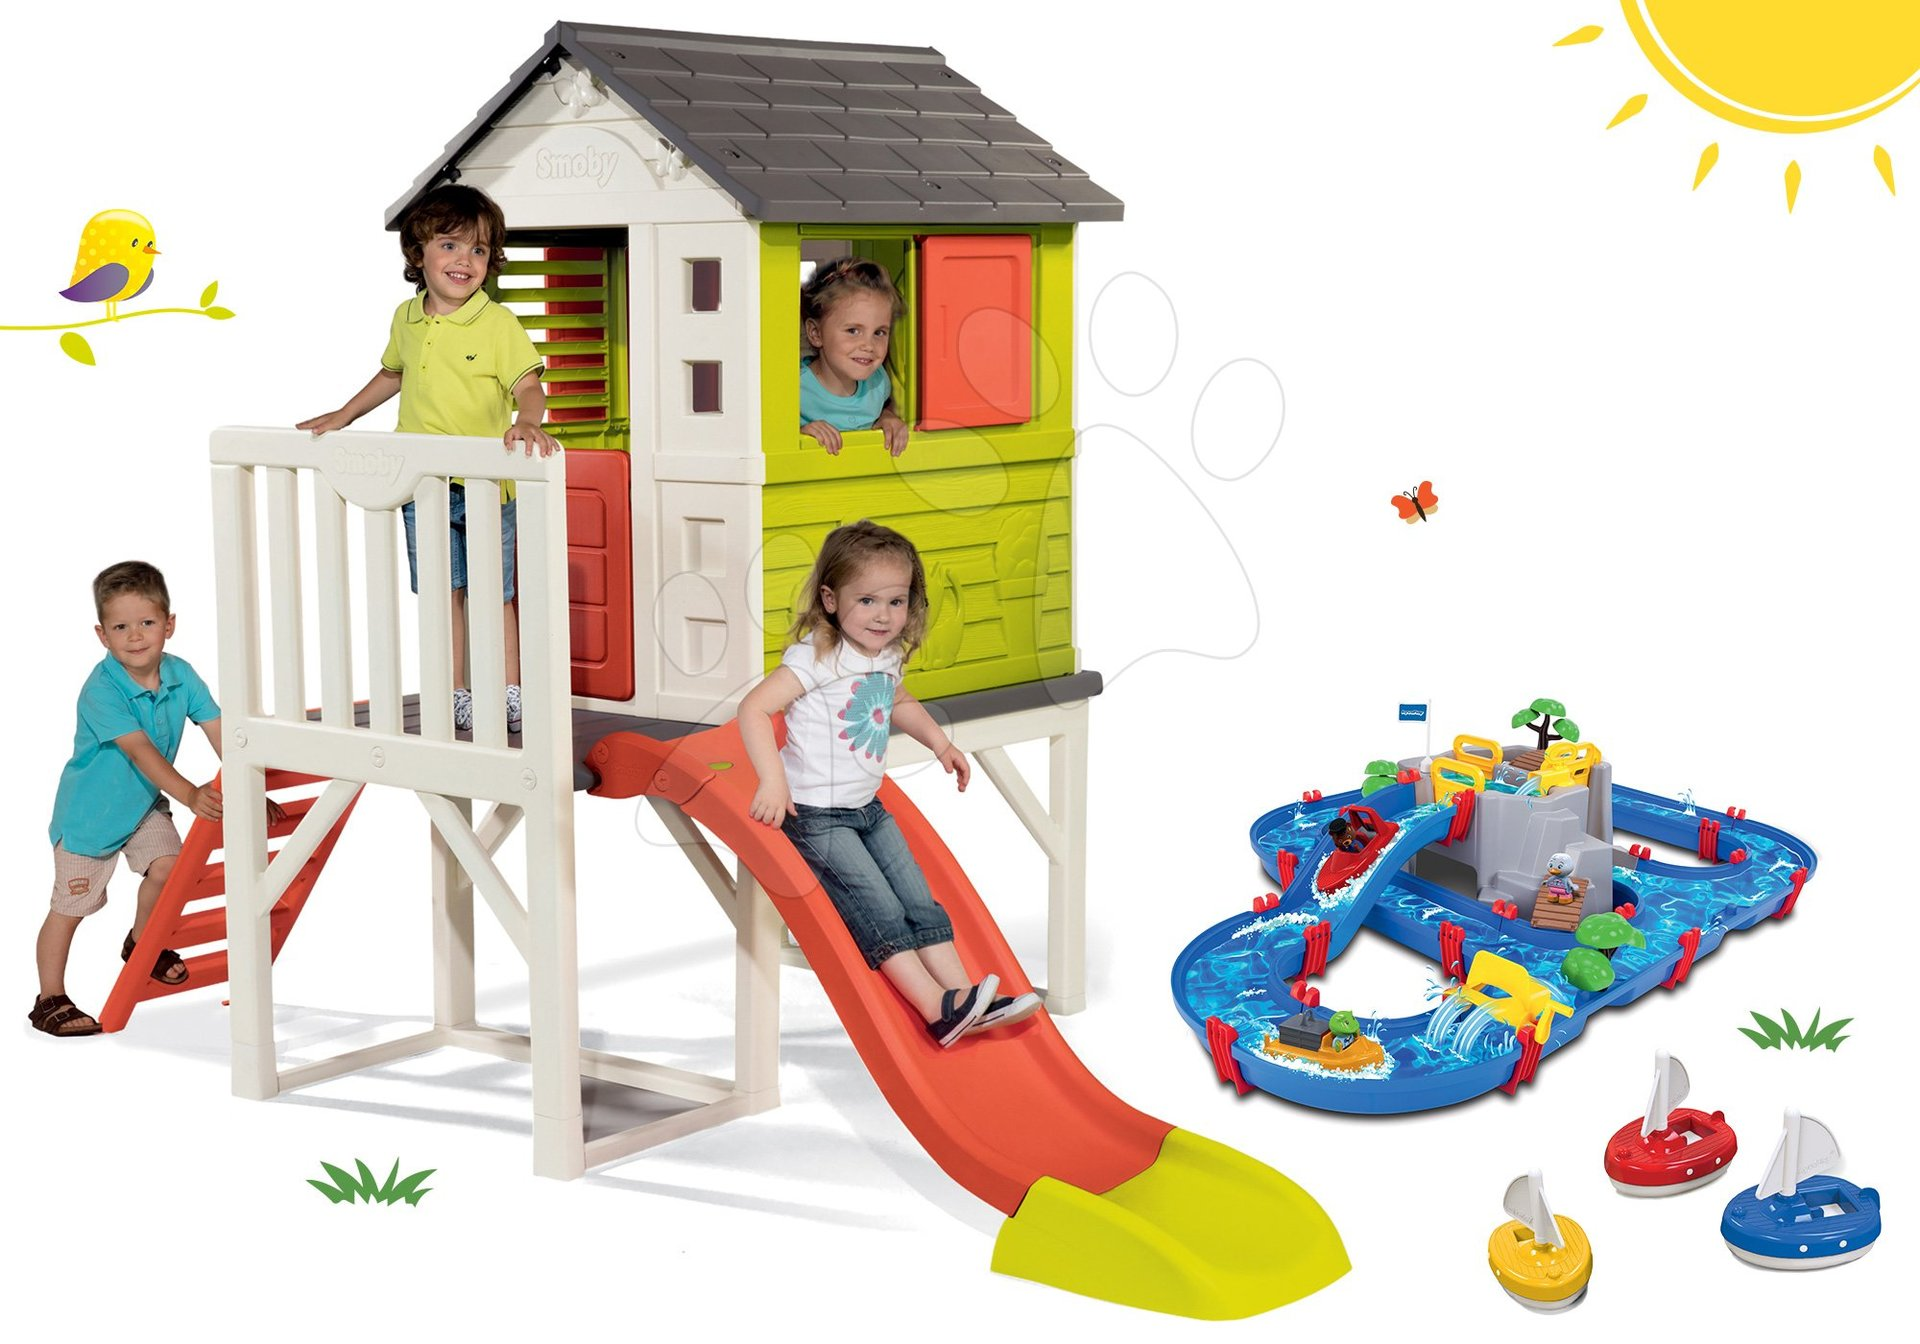 Smoby set detský domček na pilieroch Pilings House s 1,5 m šmykľavkou a vodná dráha AquaPlay Mountain Lake a loďky 810800-18